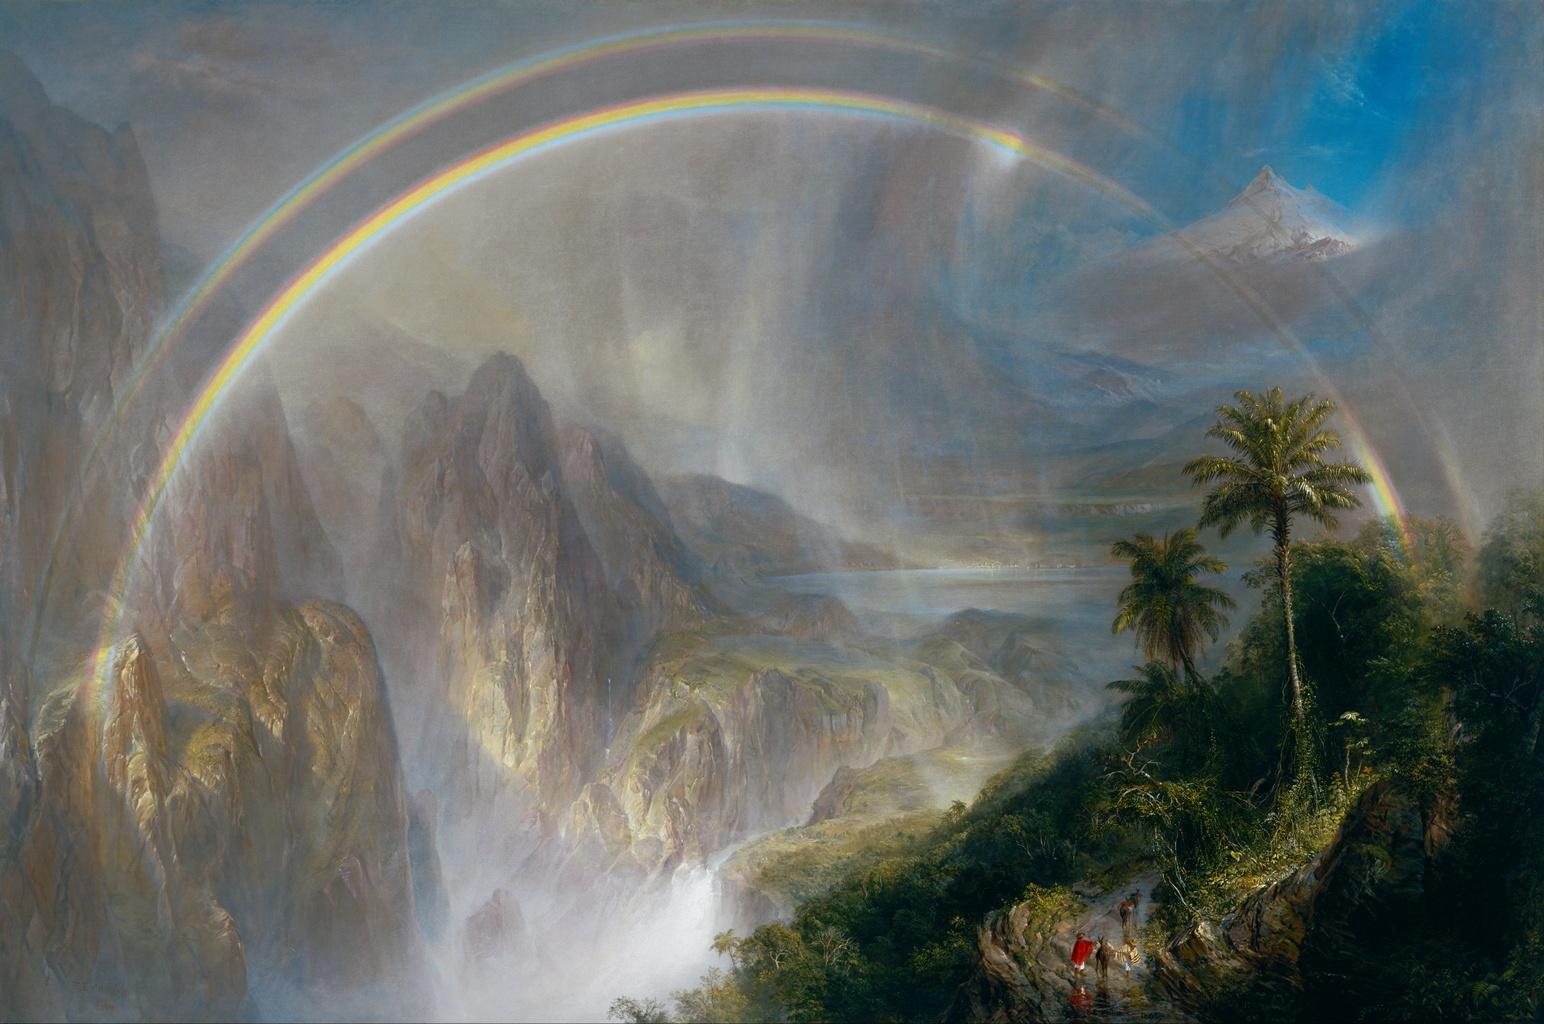 Обои водопад, Пейзаж, картина, Сердце Анд, Фредерик Эдвин Чёрч. Разное foto 13